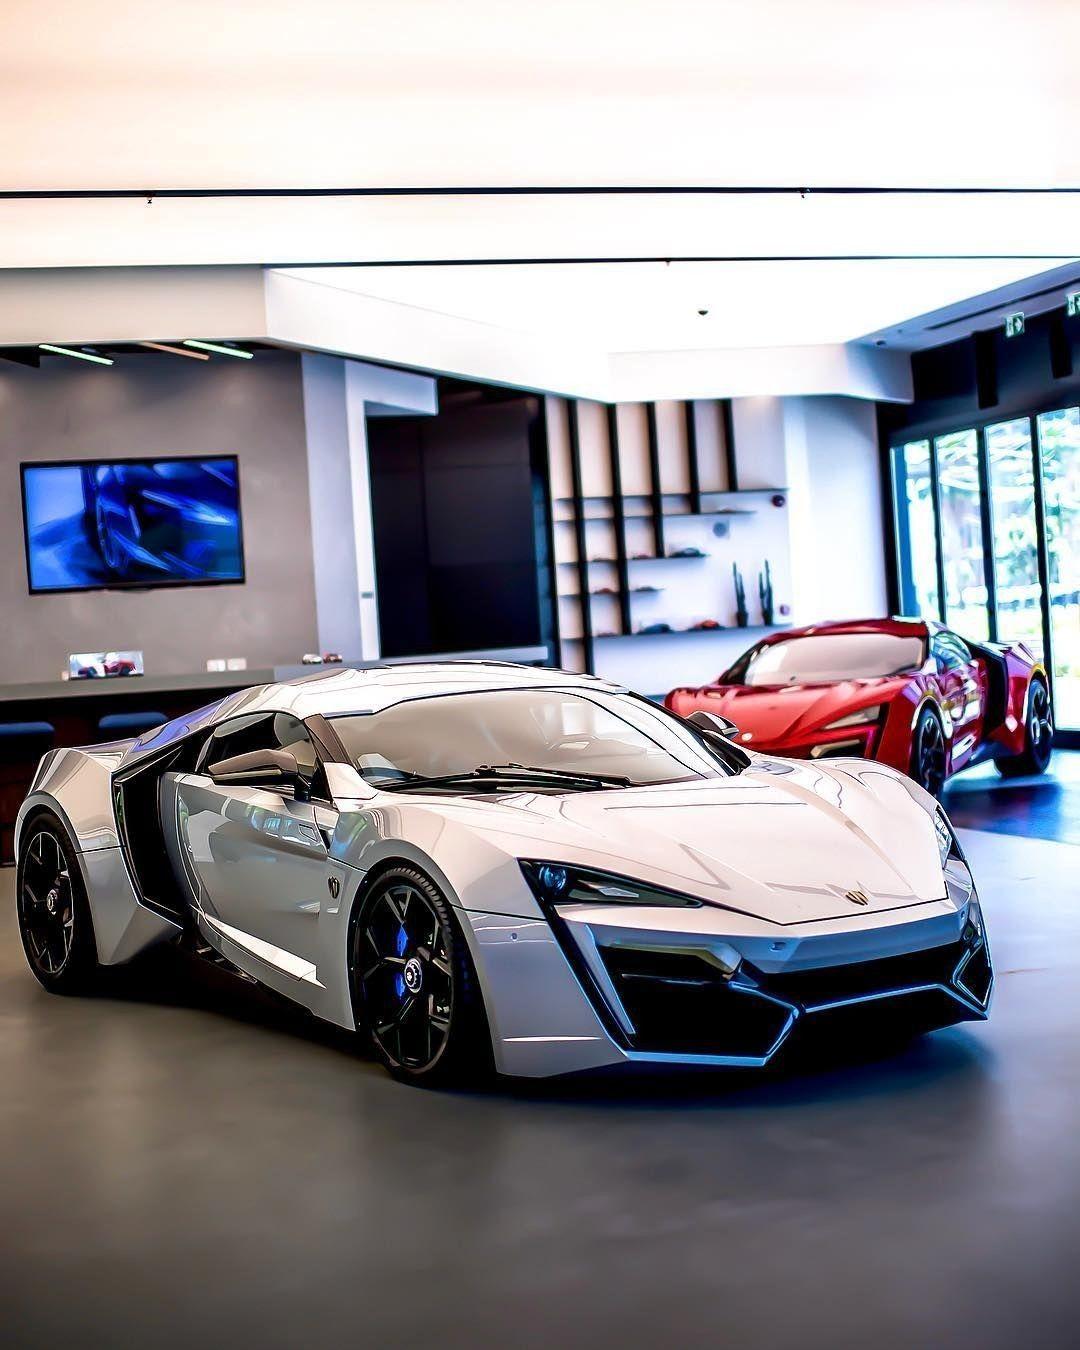 Lykan Hypersport Lykan Hypersport Lamborghini Cars Best Luxury Cars